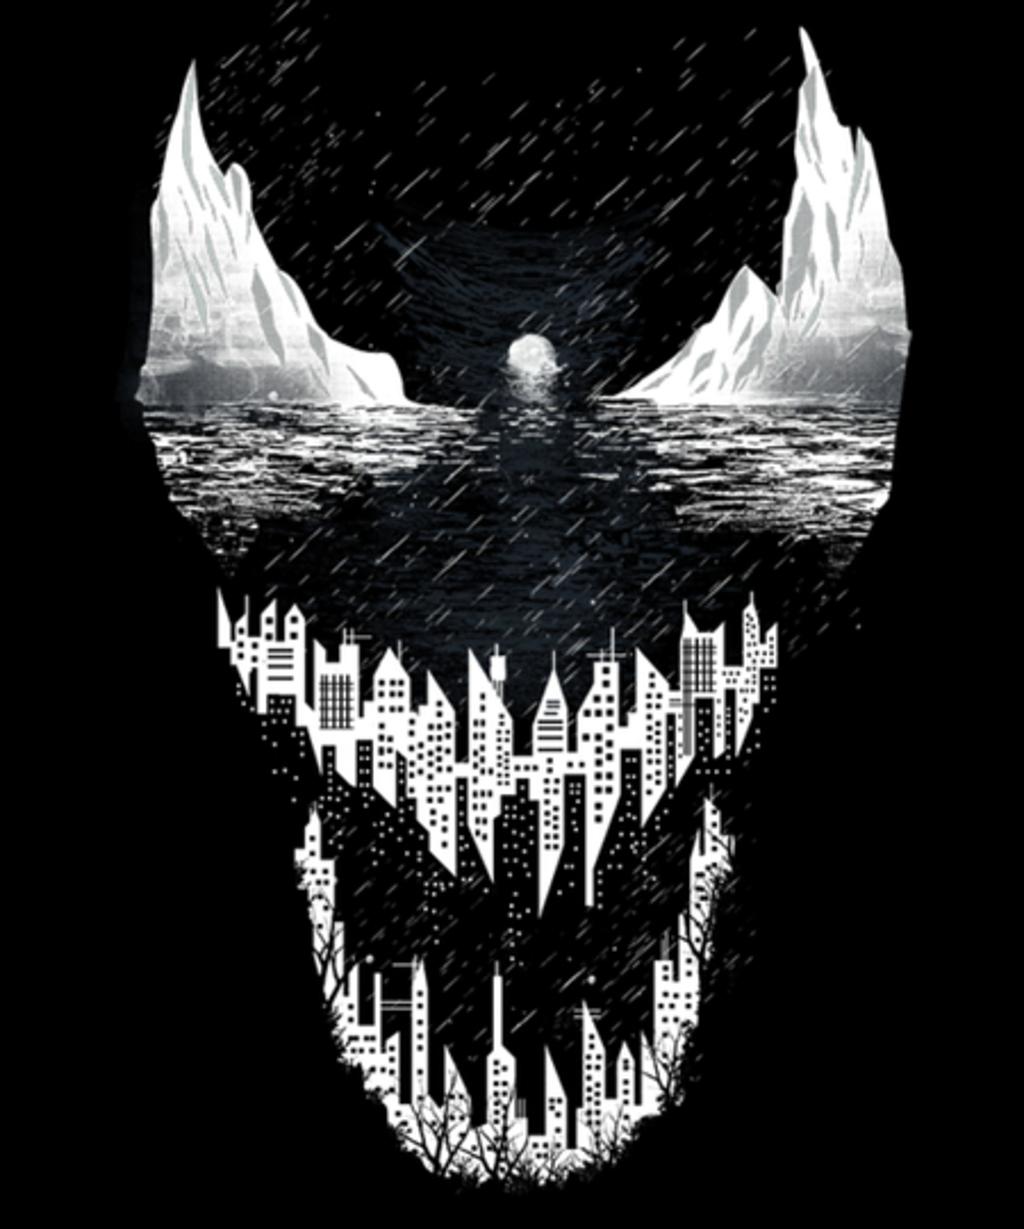 Qwertee: Symbiote City